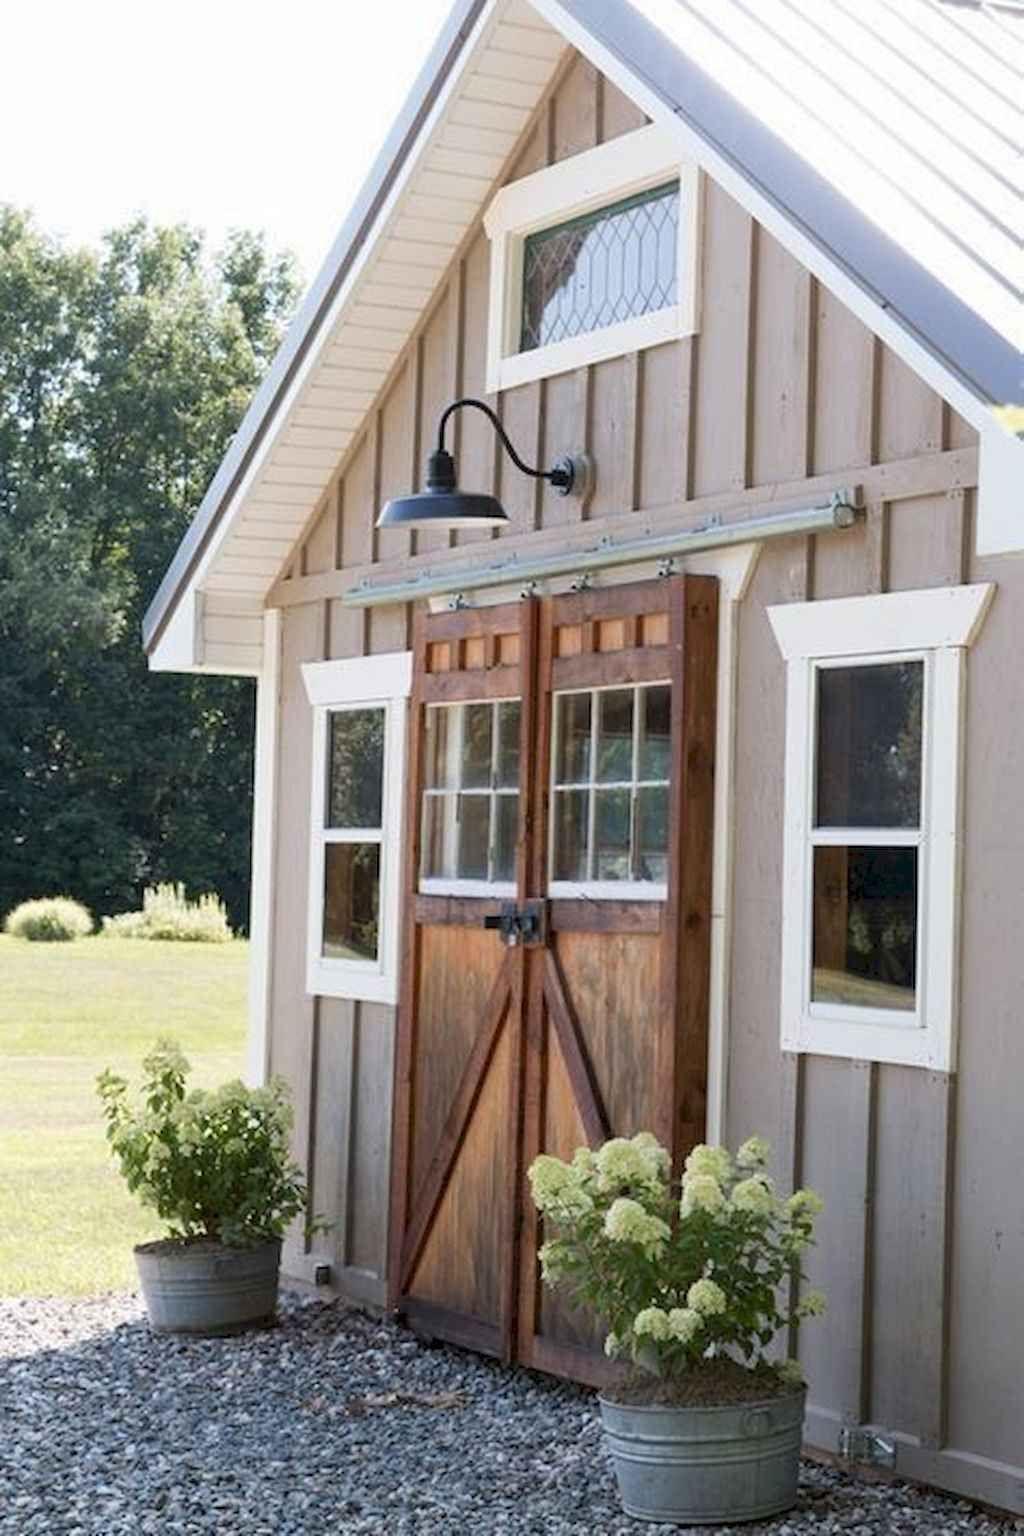 Awesome Backyard Storage Sheds Design Ideas 30